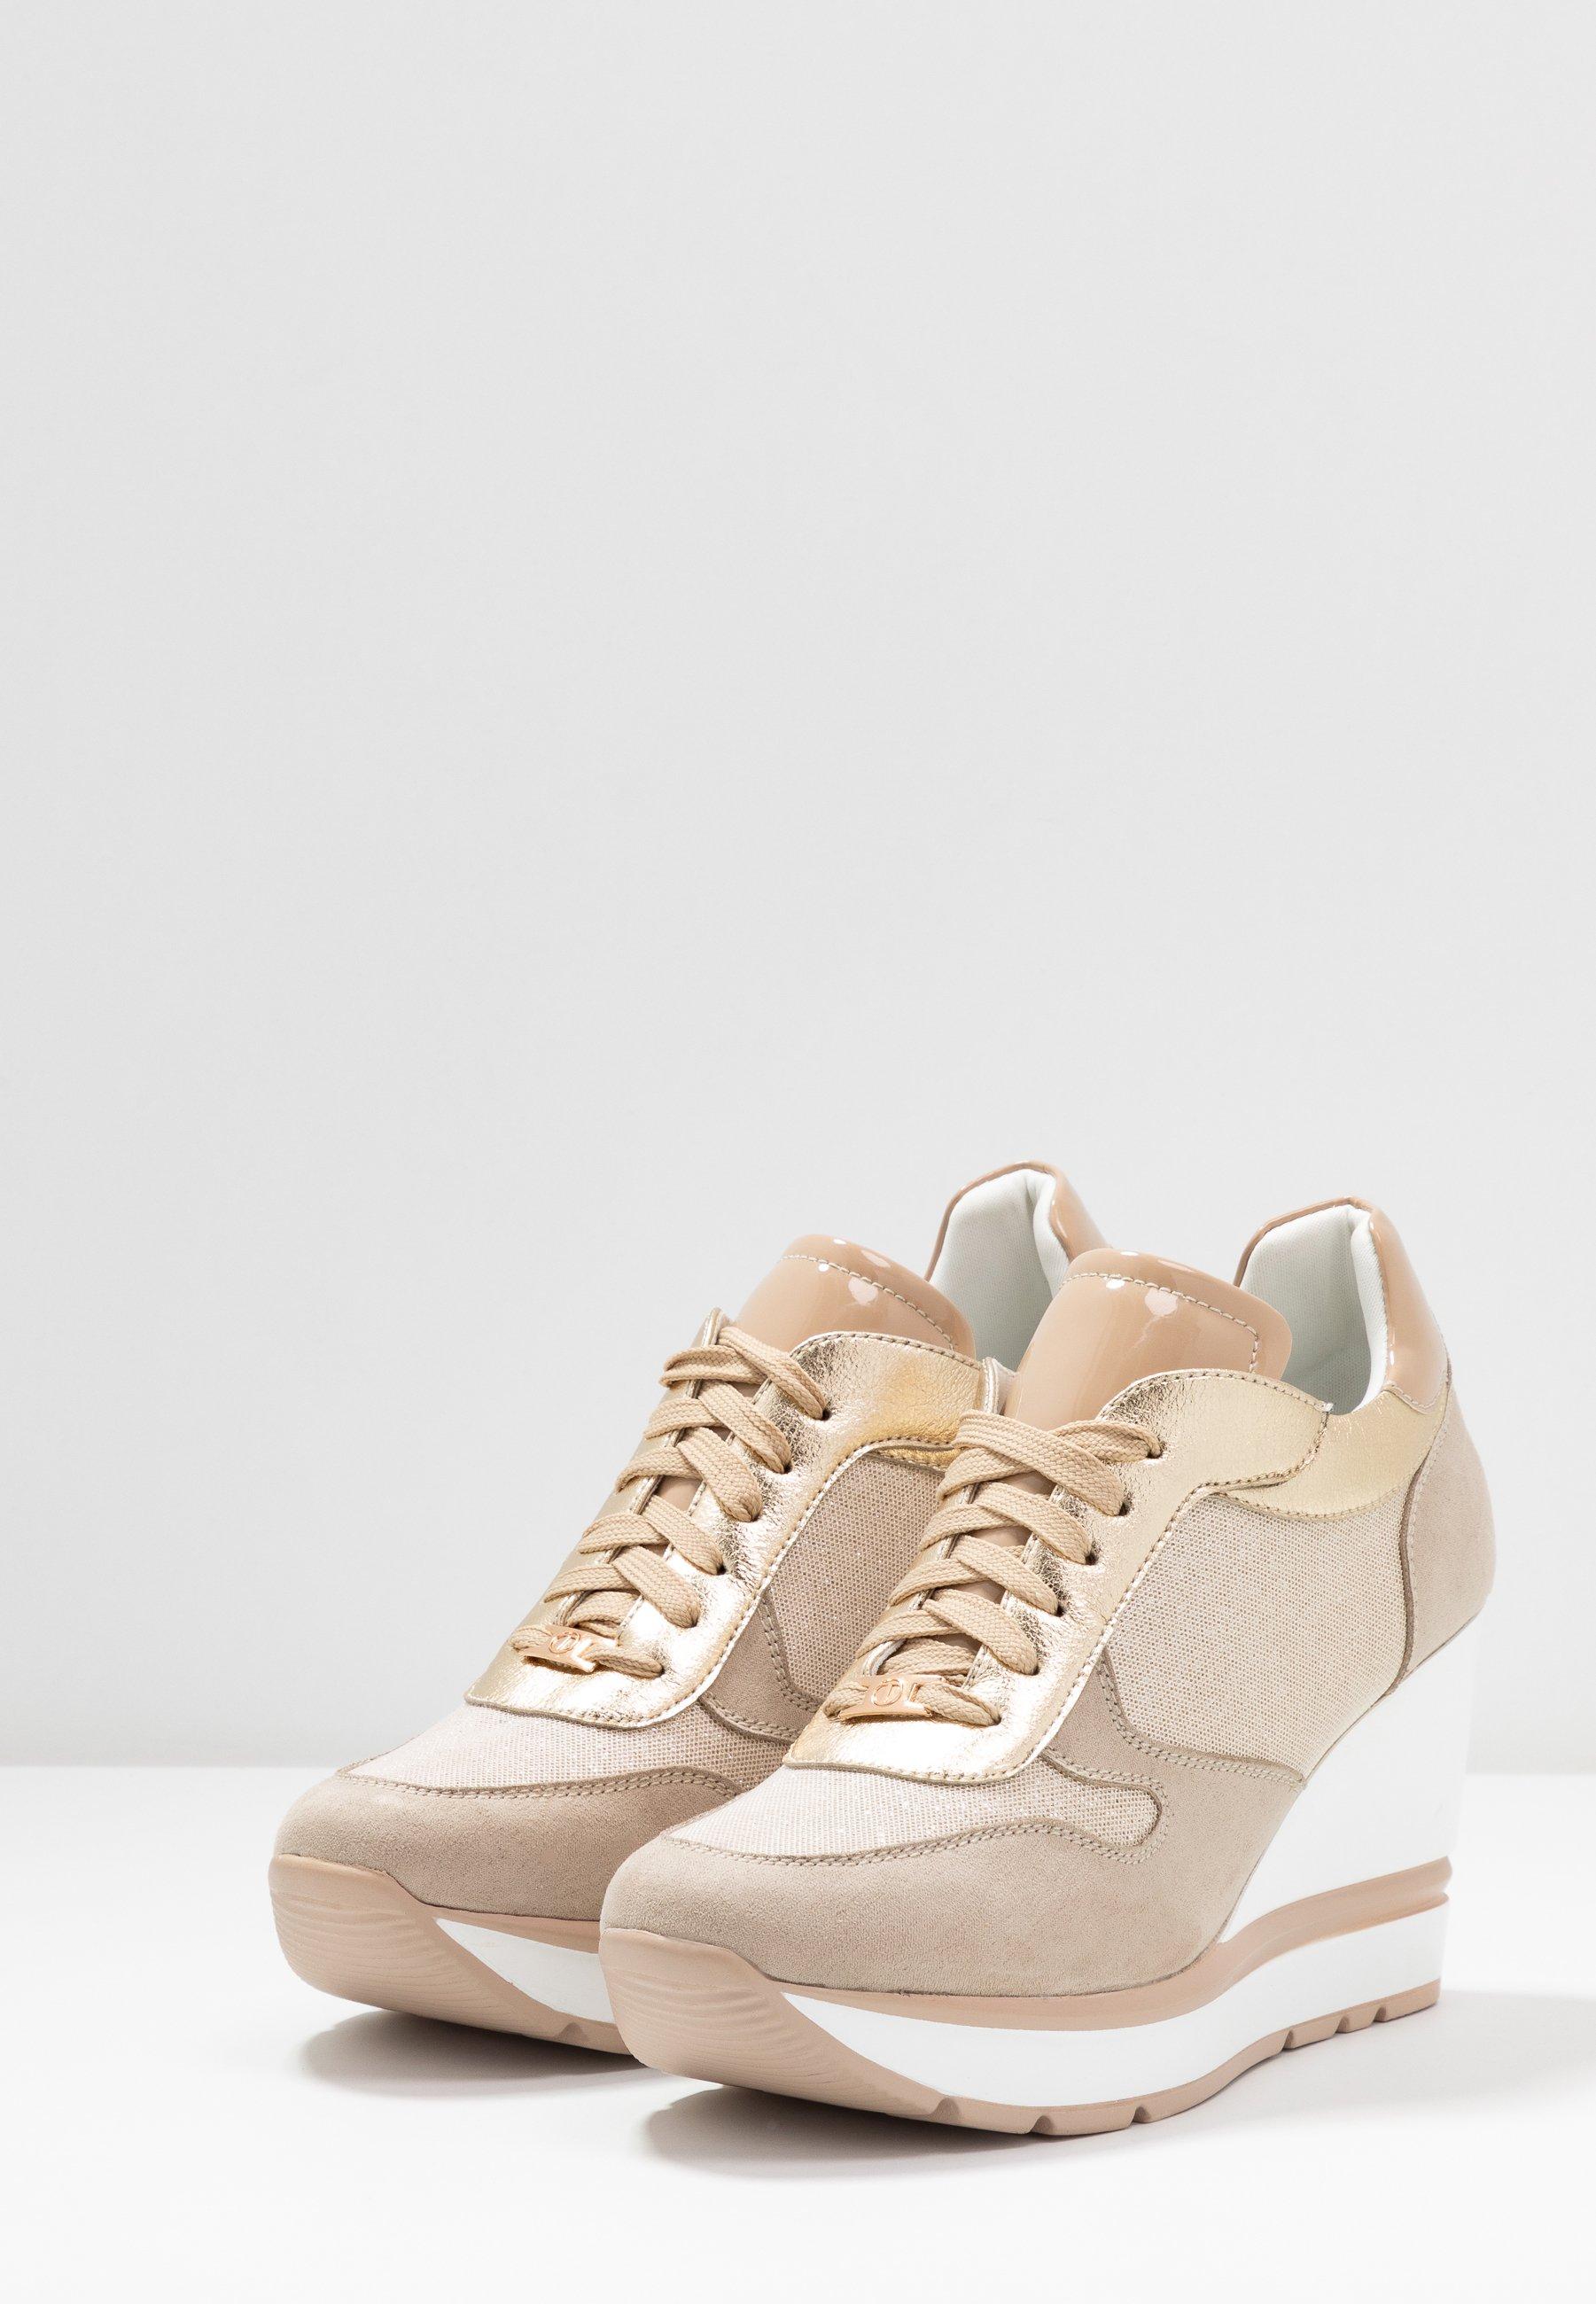 Tata Italia Sneakers - beige